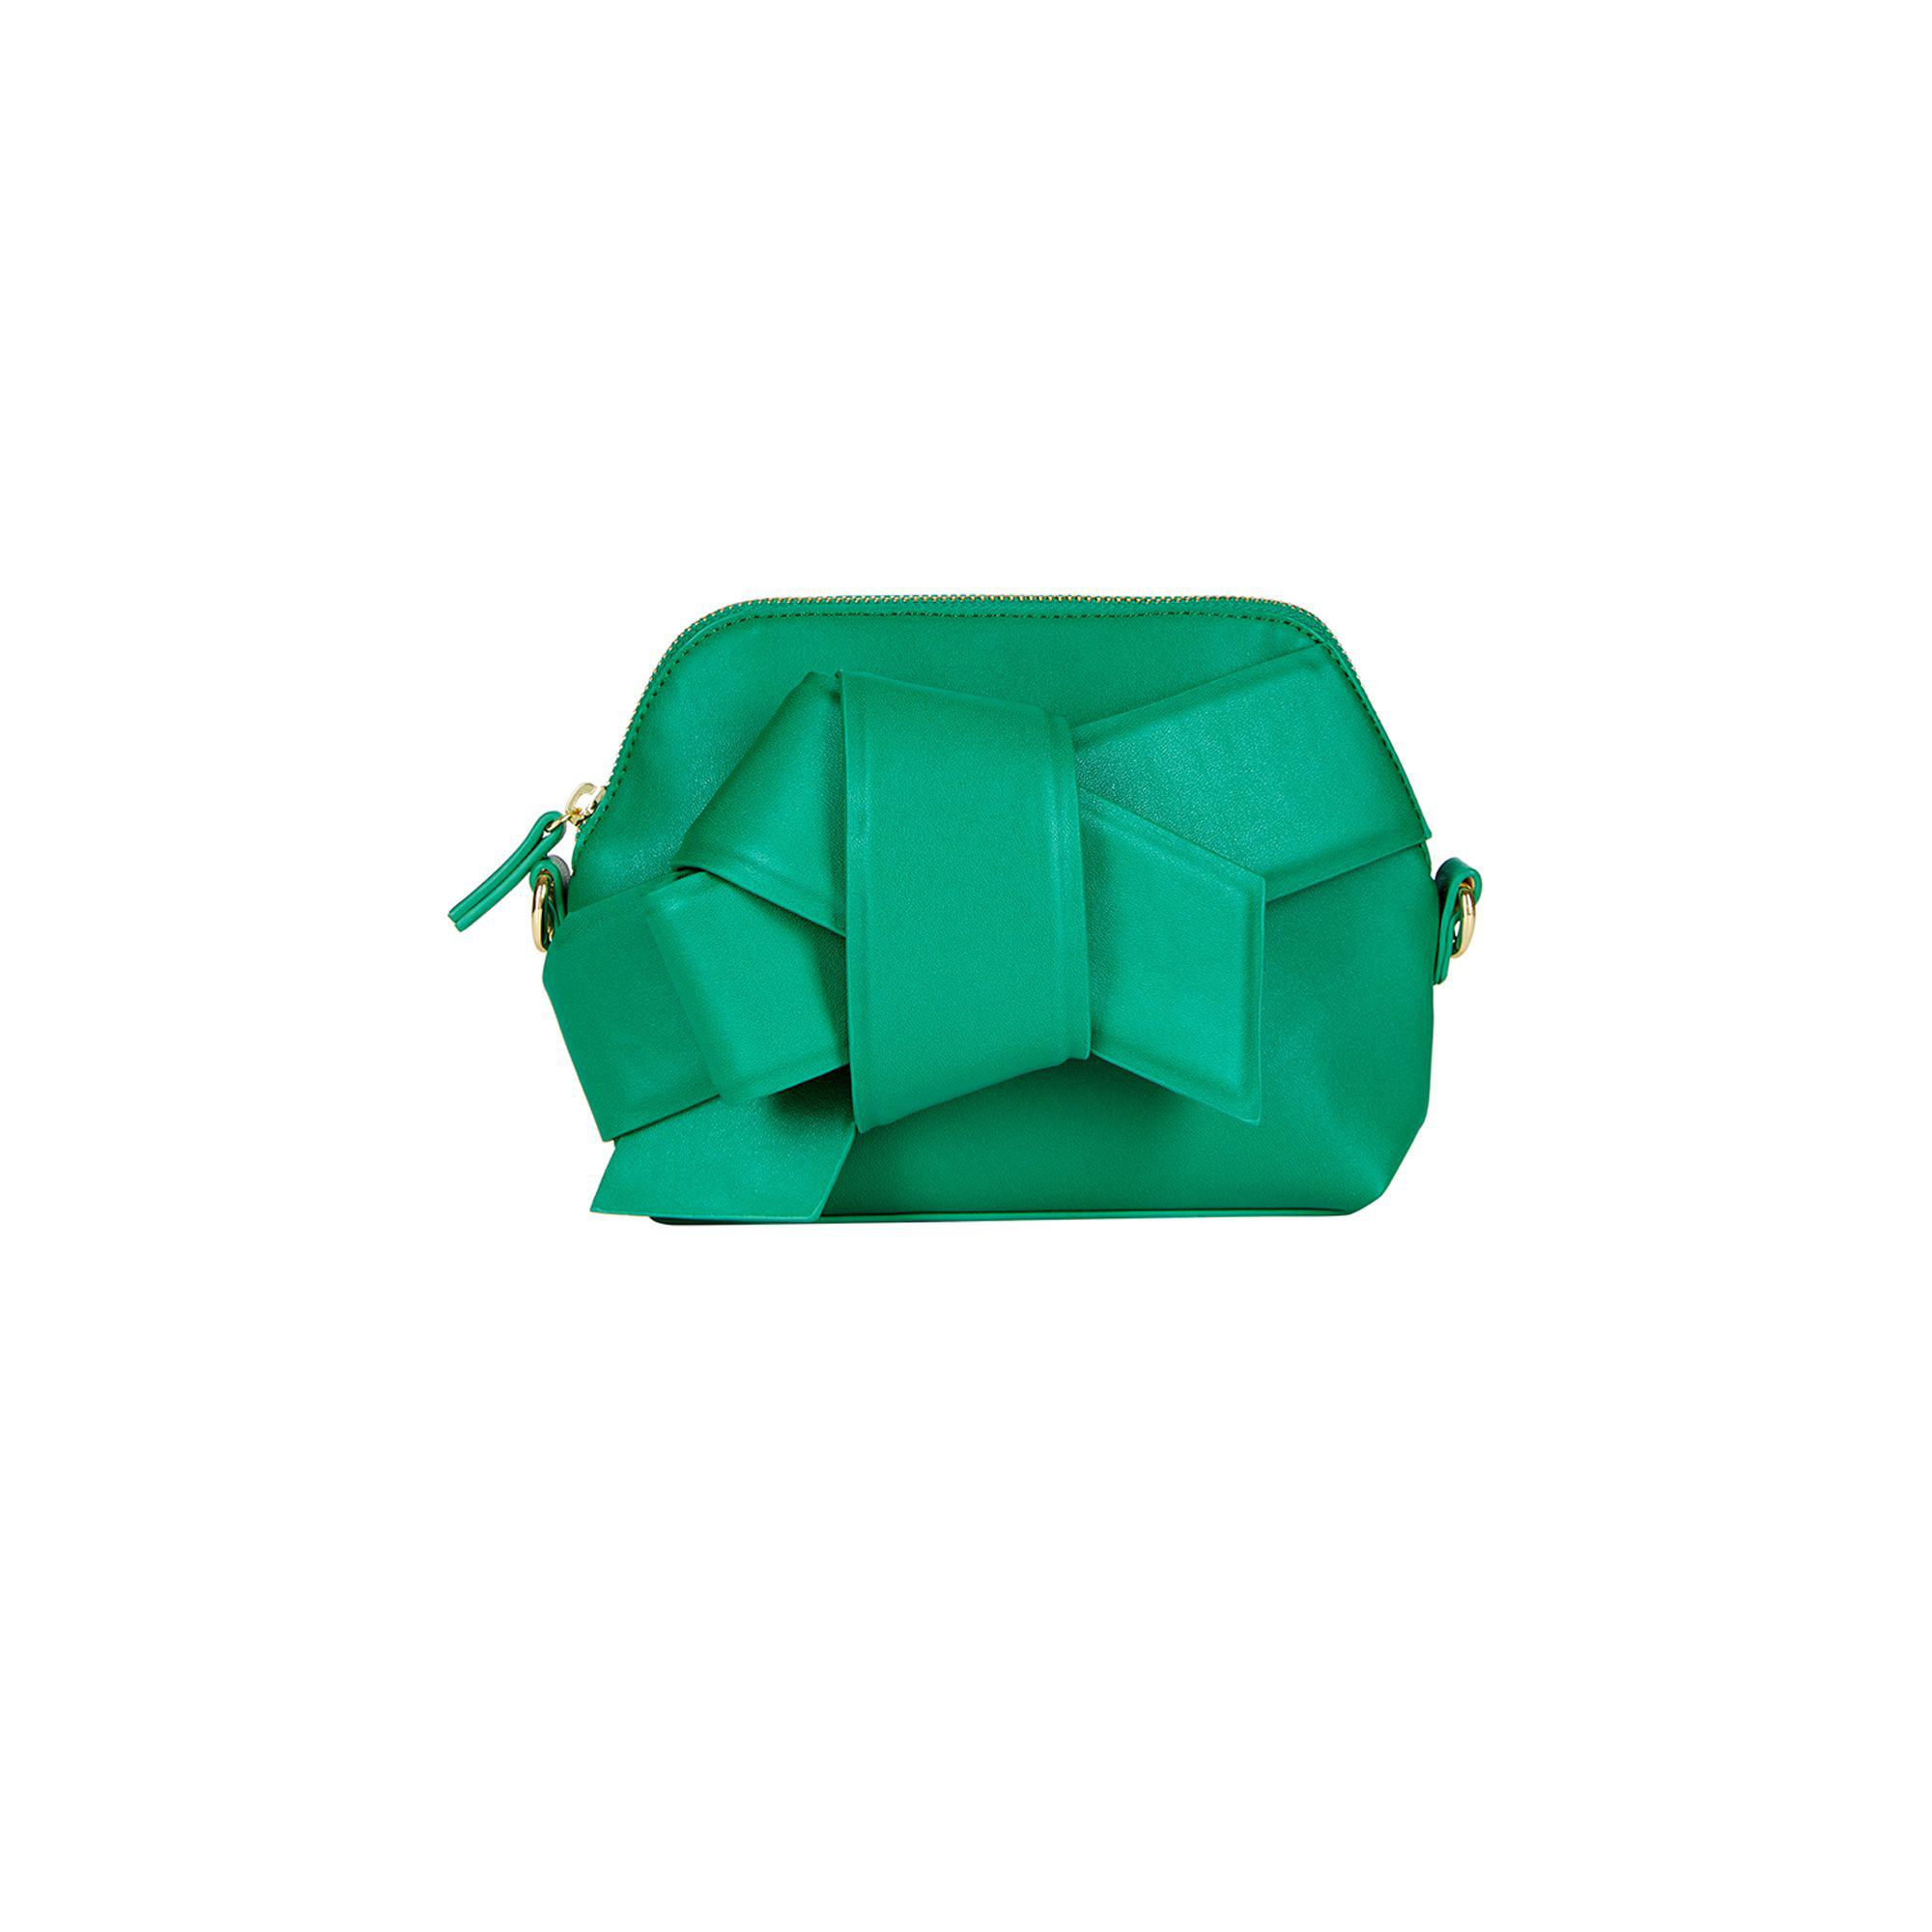 2b1a9c82893 Coast Handbags Debenhams